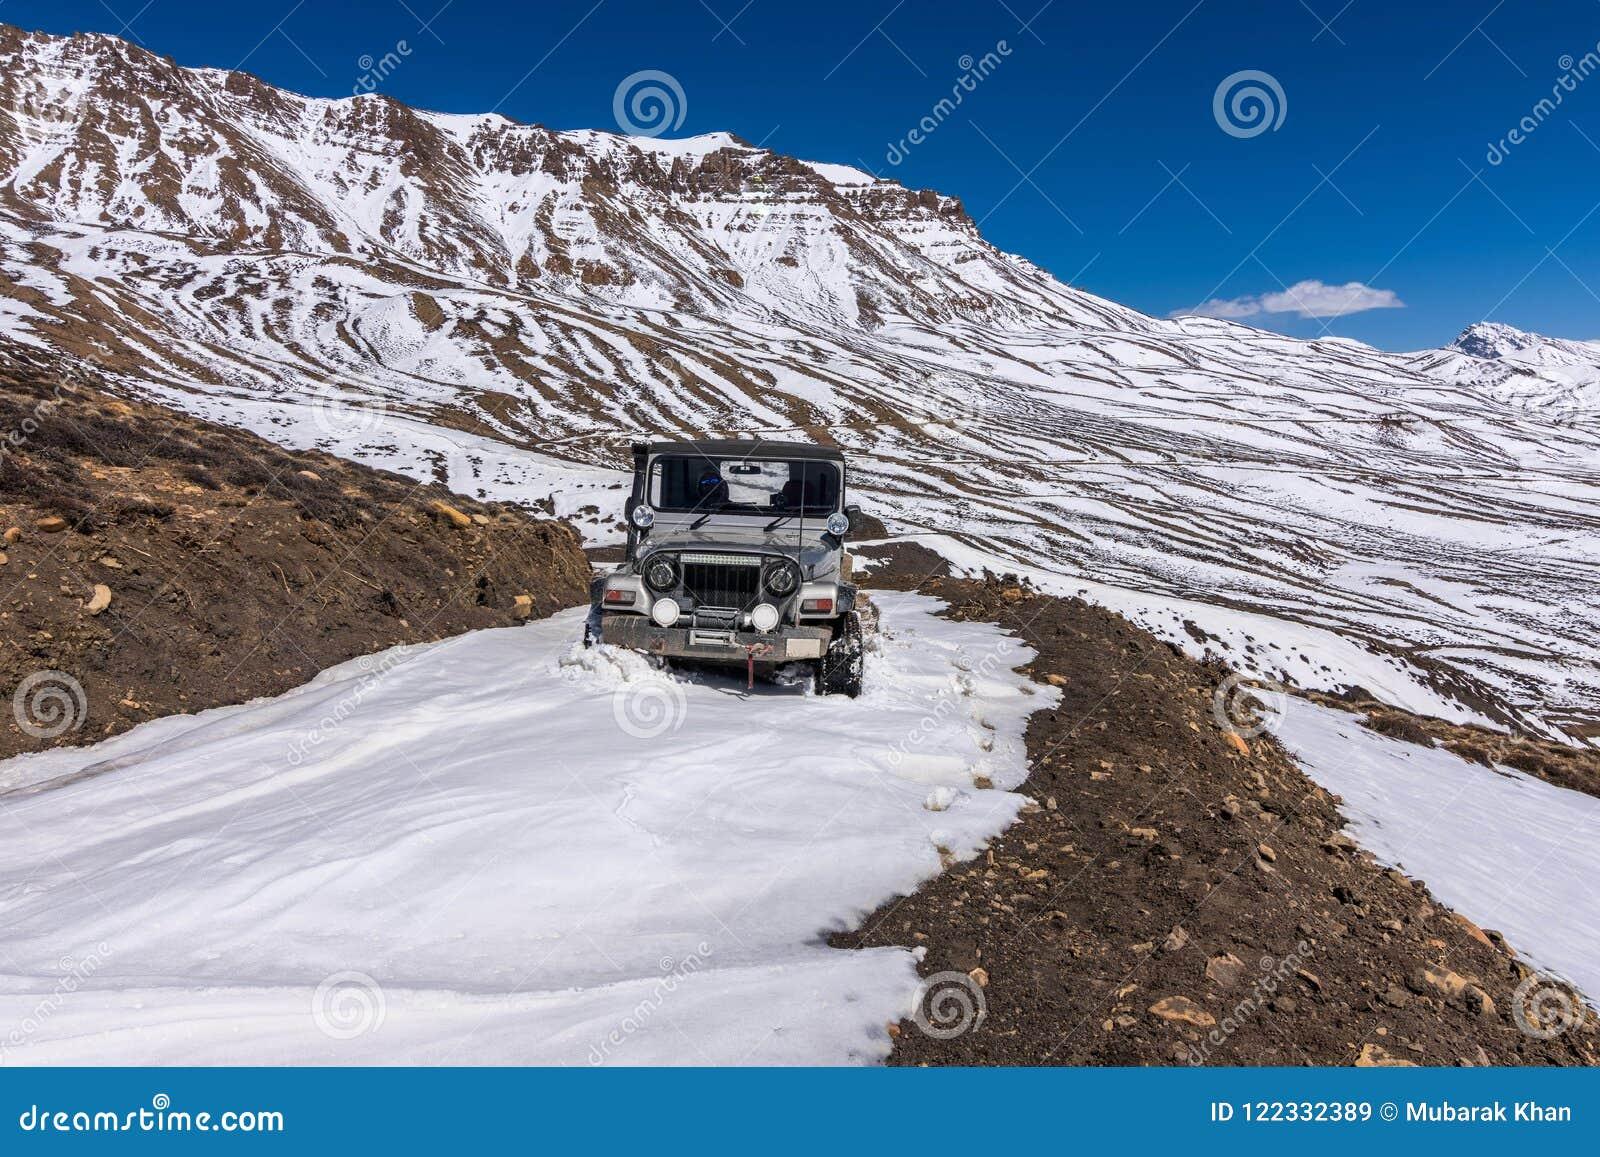 Ride On Winter Spiti Landscape Of Spiti Valley Himachal Pradesh